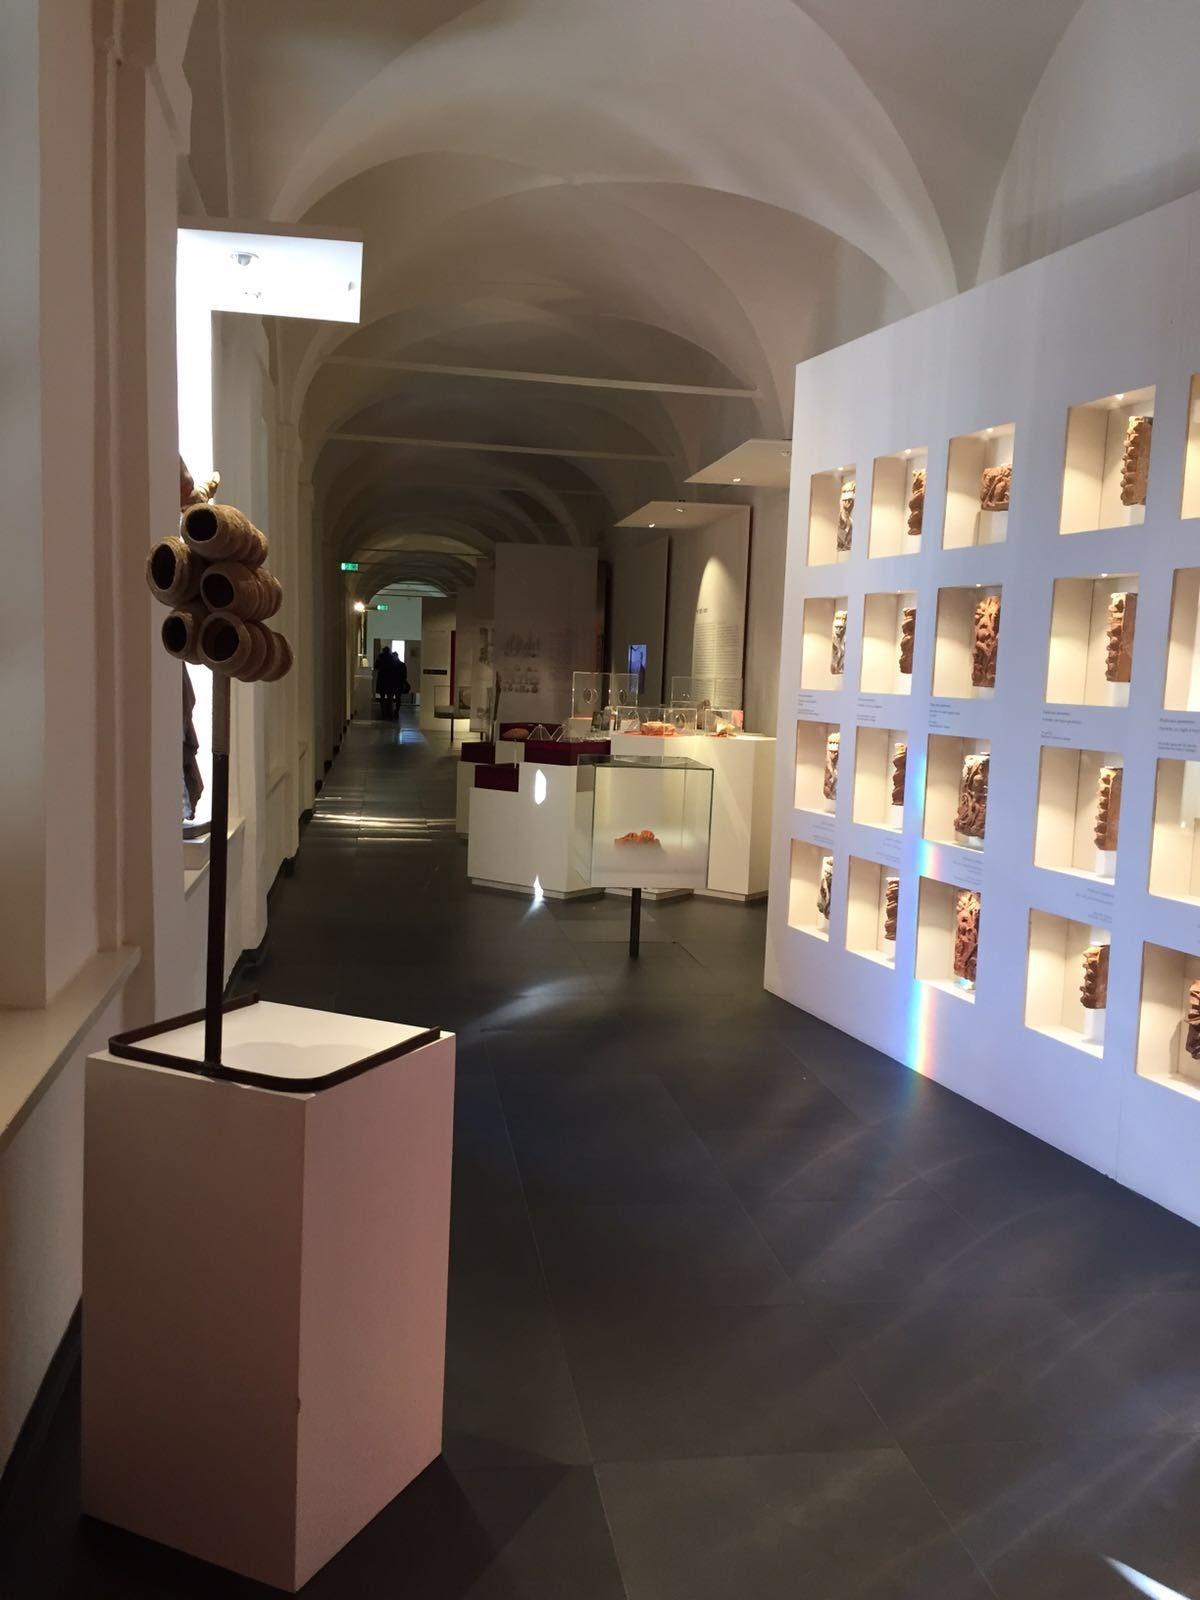 Oltre - installation view at Museo Garda, Ivrea 2016 - photo Franco Marino